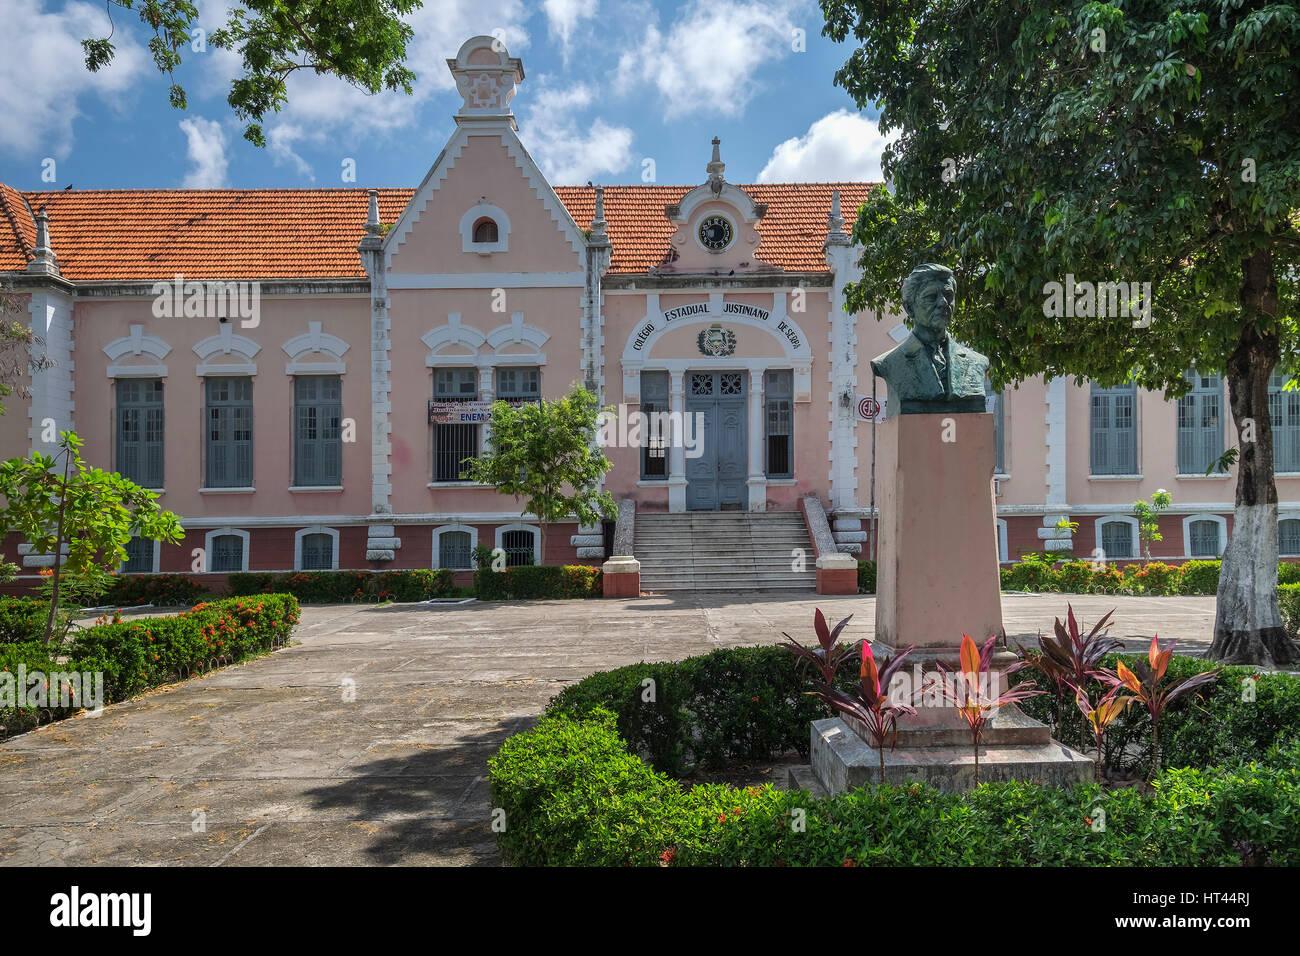 The Justinian State College of Serpa (or Colégio Estadual Justiniano de Serpa), Av. Santos Dumont, Fortaleza, State Stock Photo